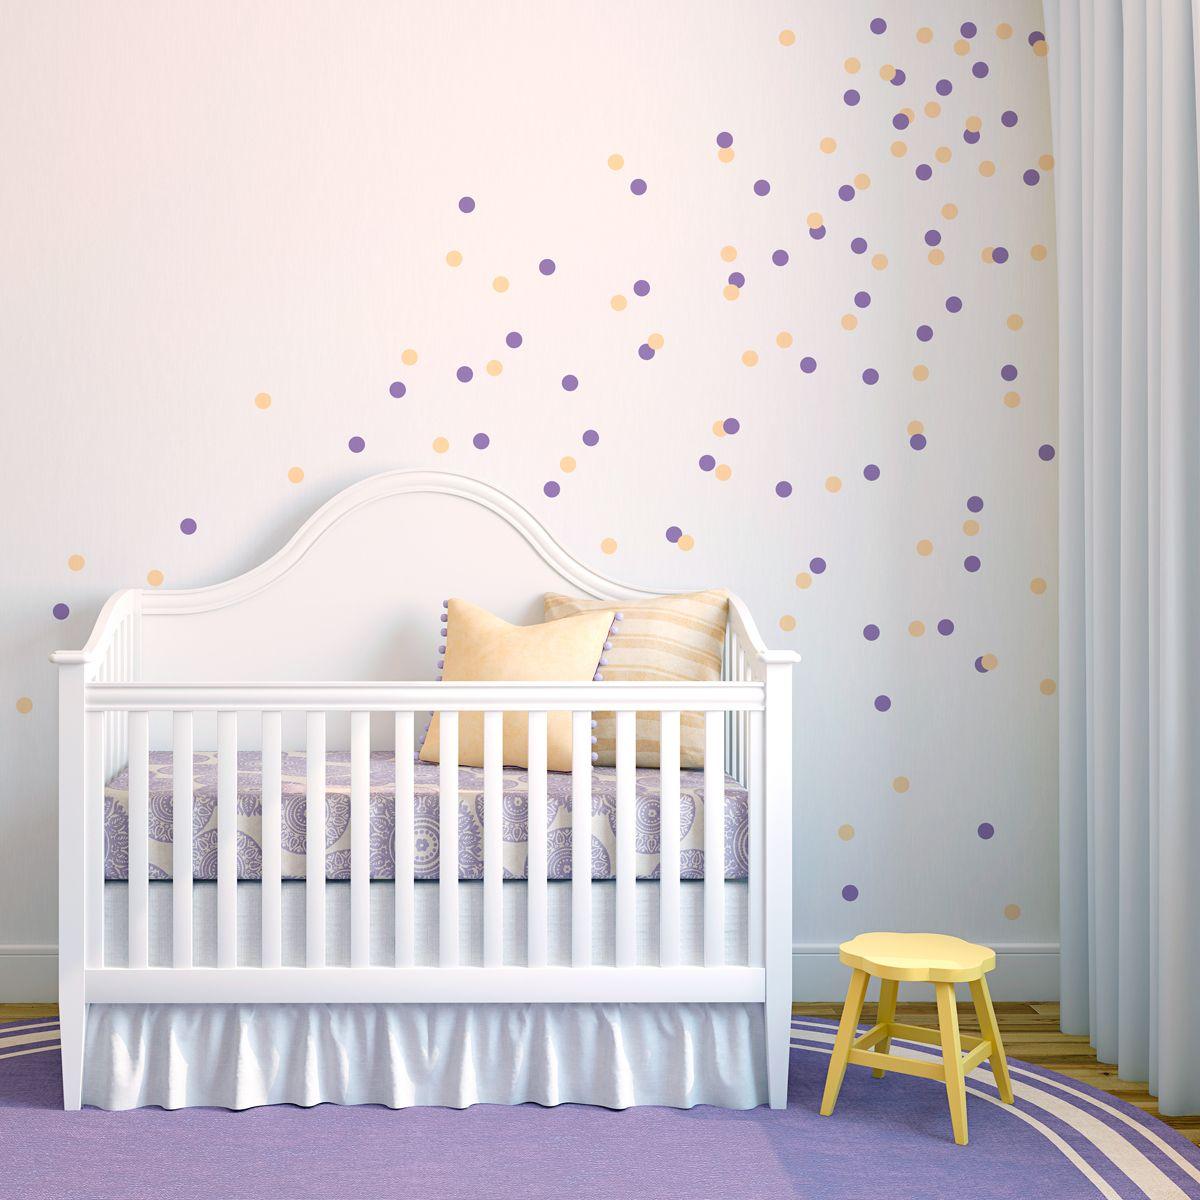 Confetti Dots Wall Decal Fun Confetti Wall Stickers Baby Girl Room Polka Dot Walls Confetti Wall